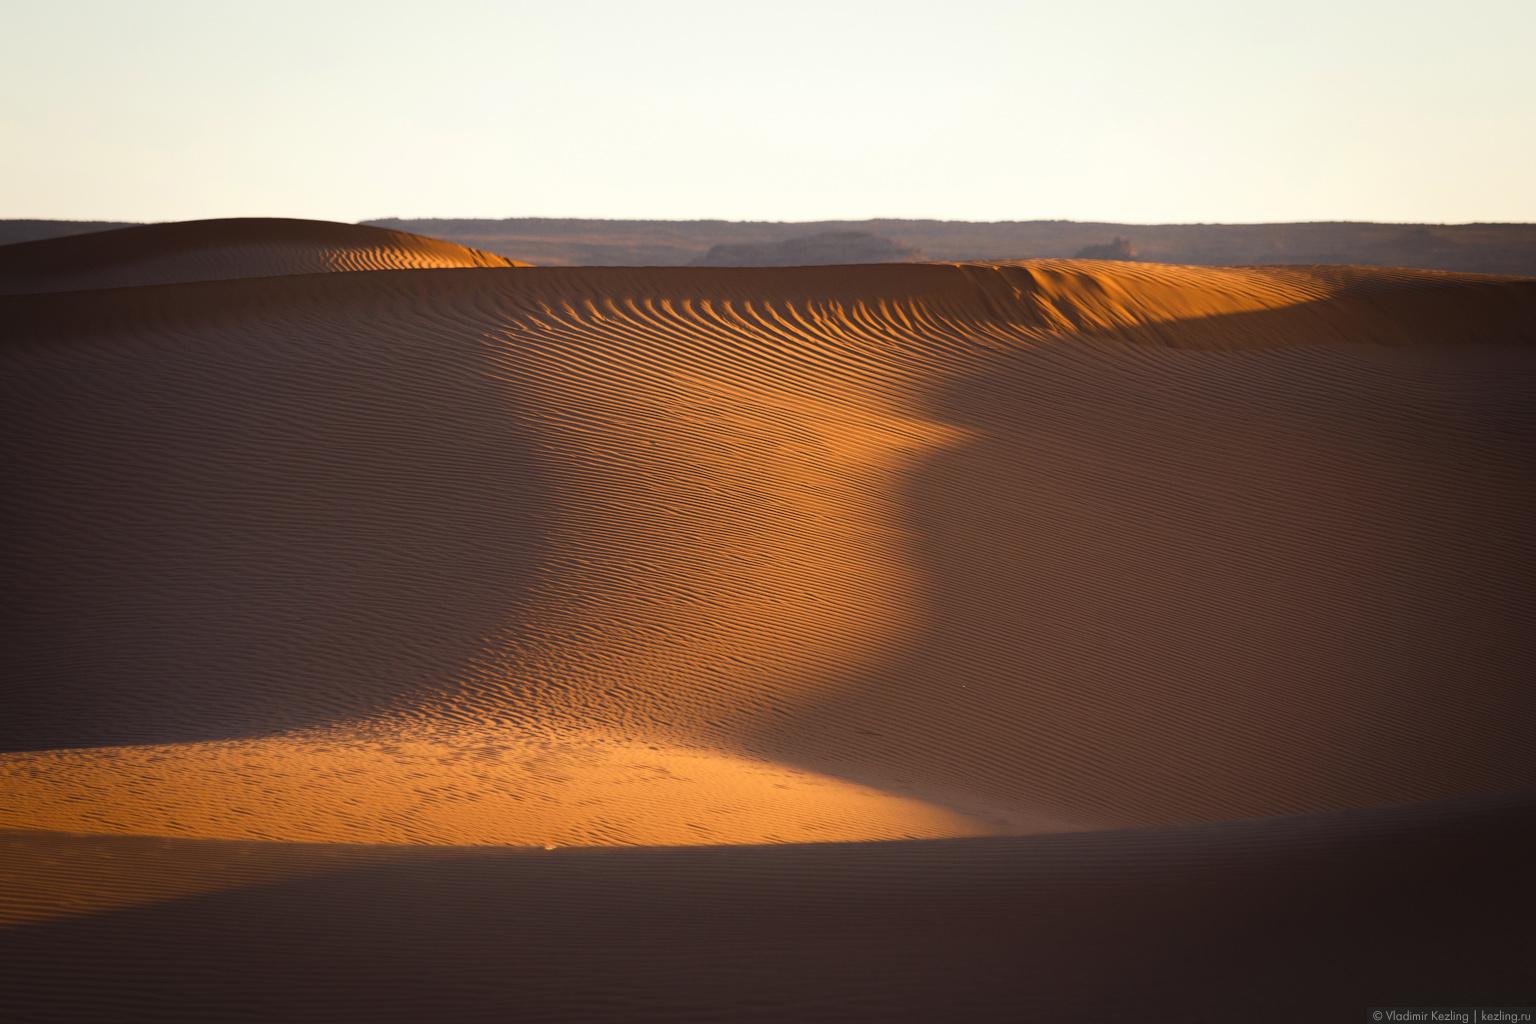 Марокканские сказки. Пустыня Сахара. Эрг Лихоуди